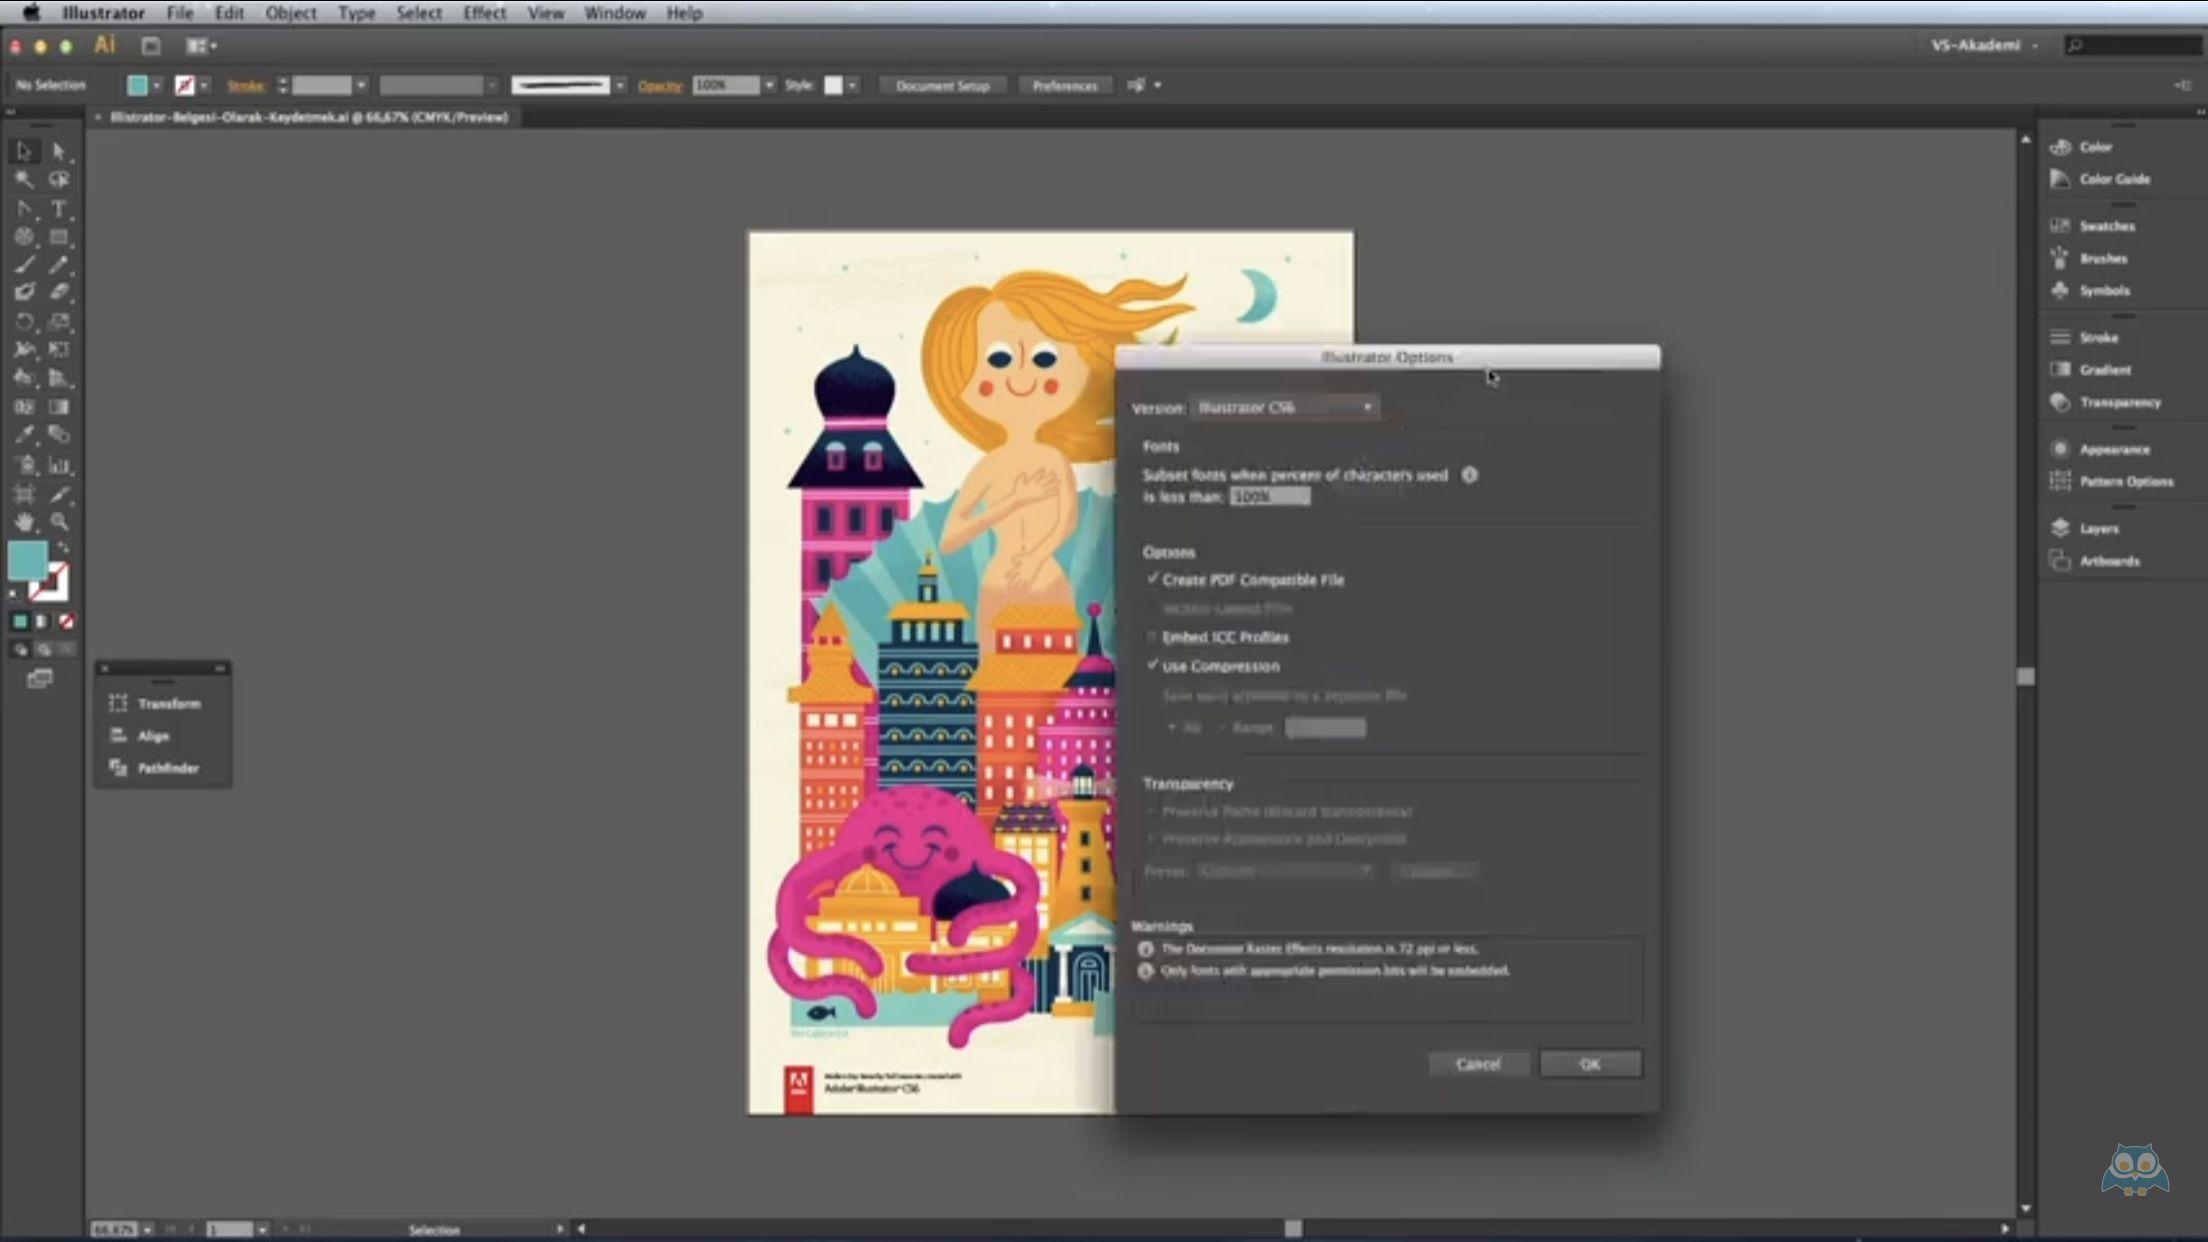 Bastan Sona Tek Videoda Adobe Illustrator Cs6 Baslangic Egitimi Dersleri Ucretsiz Adobe Adobeillustrator Full Free Egitim Ders Dersleri Kurs Tasari